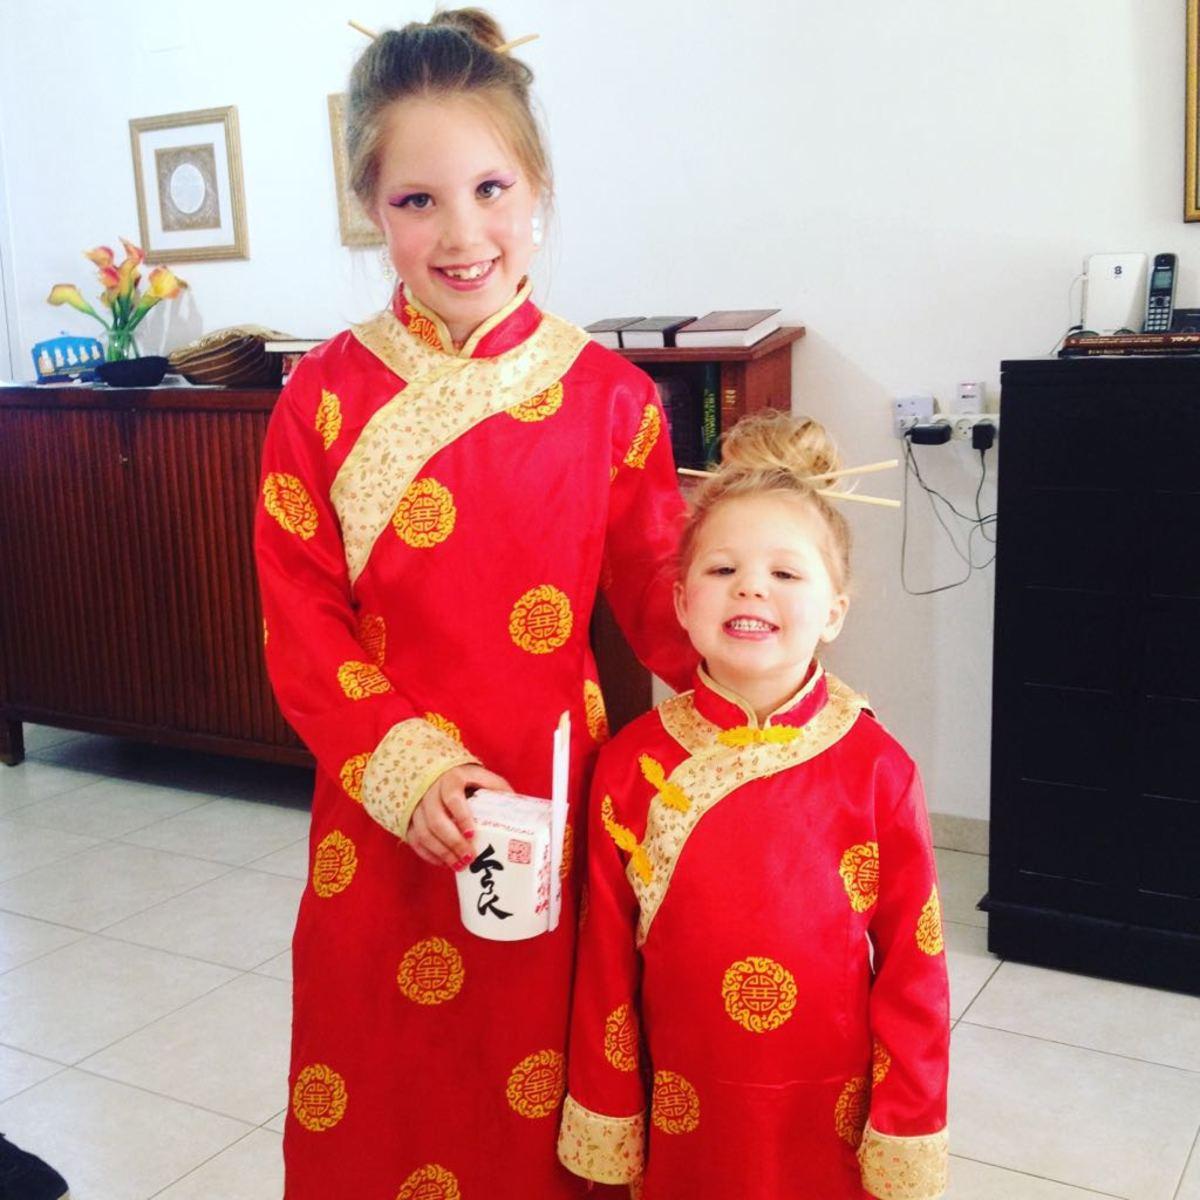 GIRLS IN ASIAN COSTUME